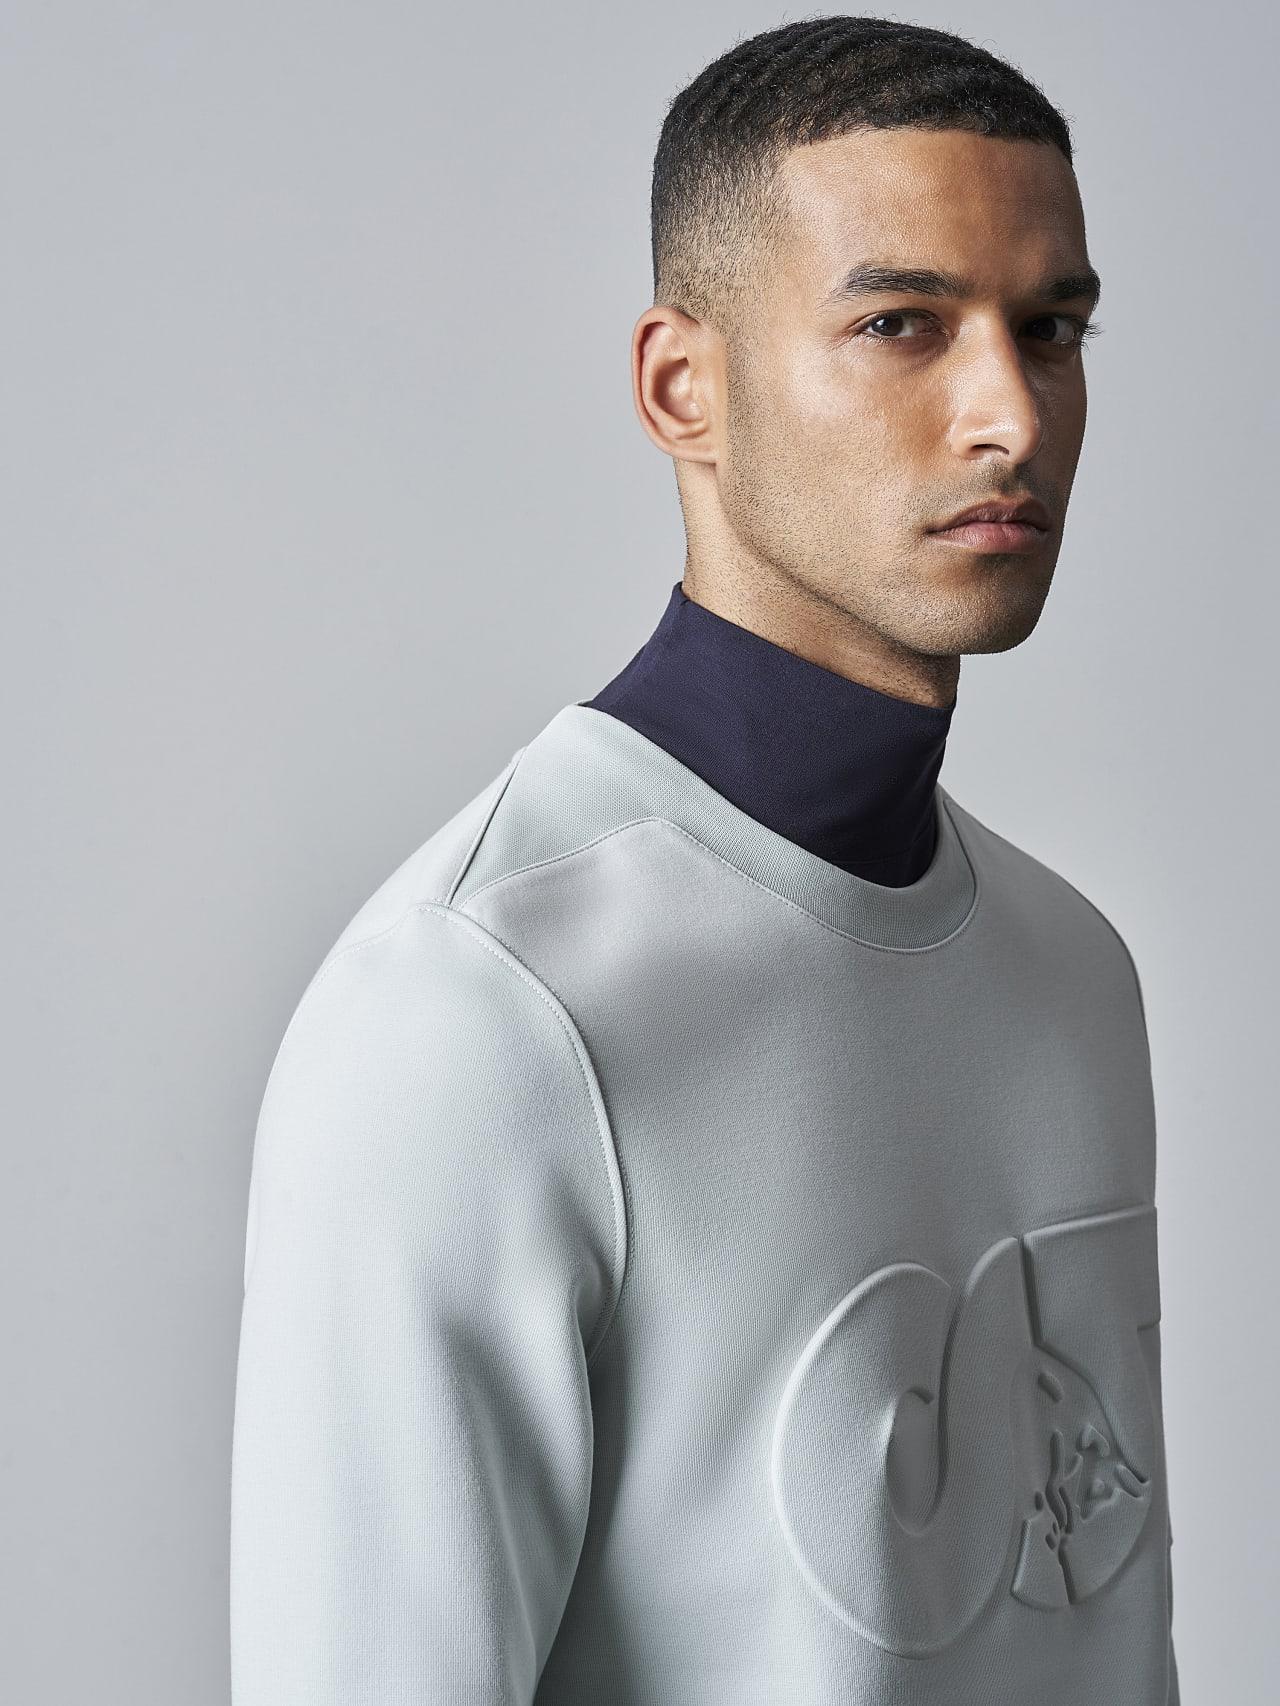 SCONA V1.Y5.02 Premium Sweatshirt Blass Blau Extra Alpha Tauri